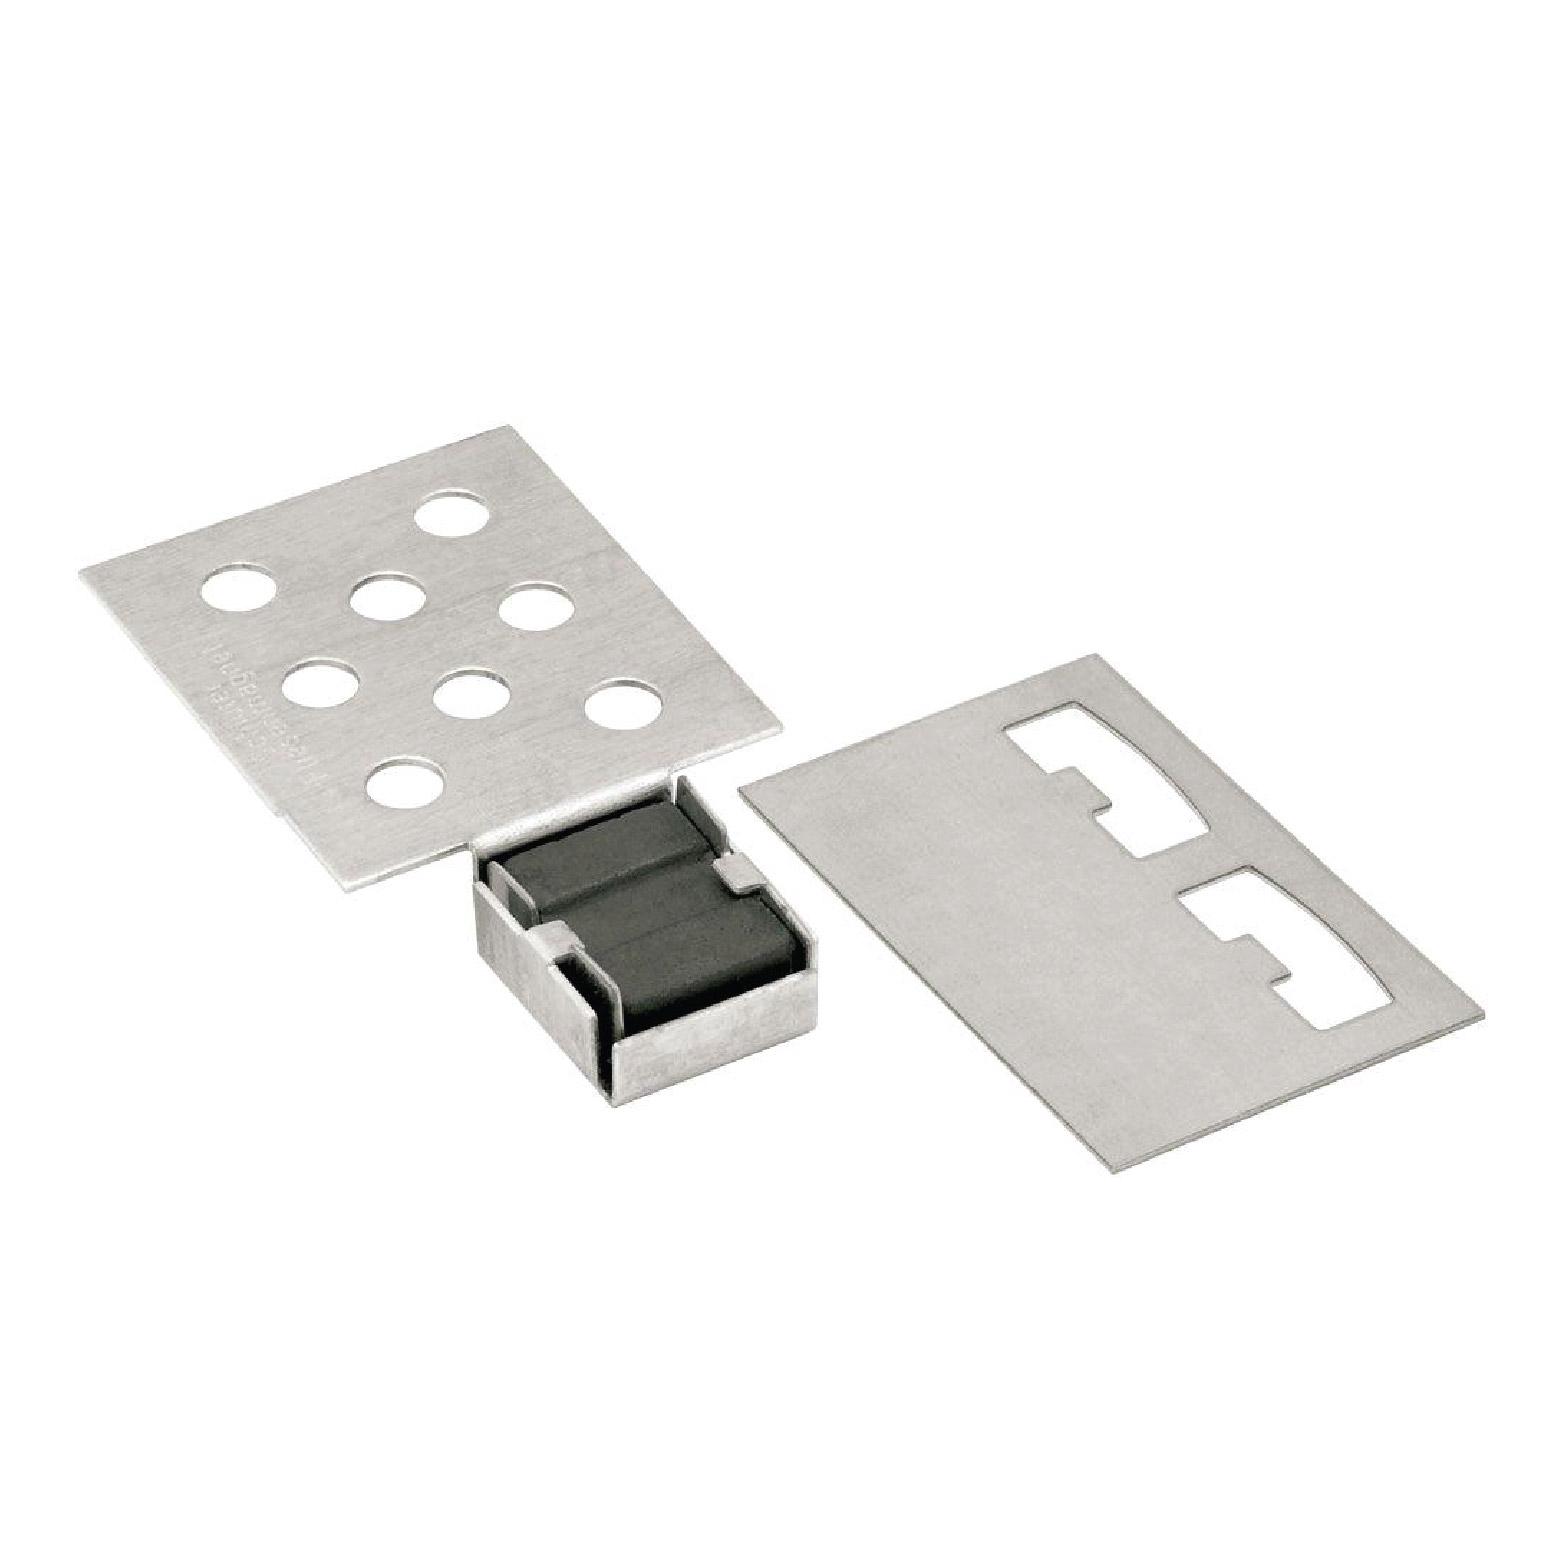 REMA Access Panel Kit